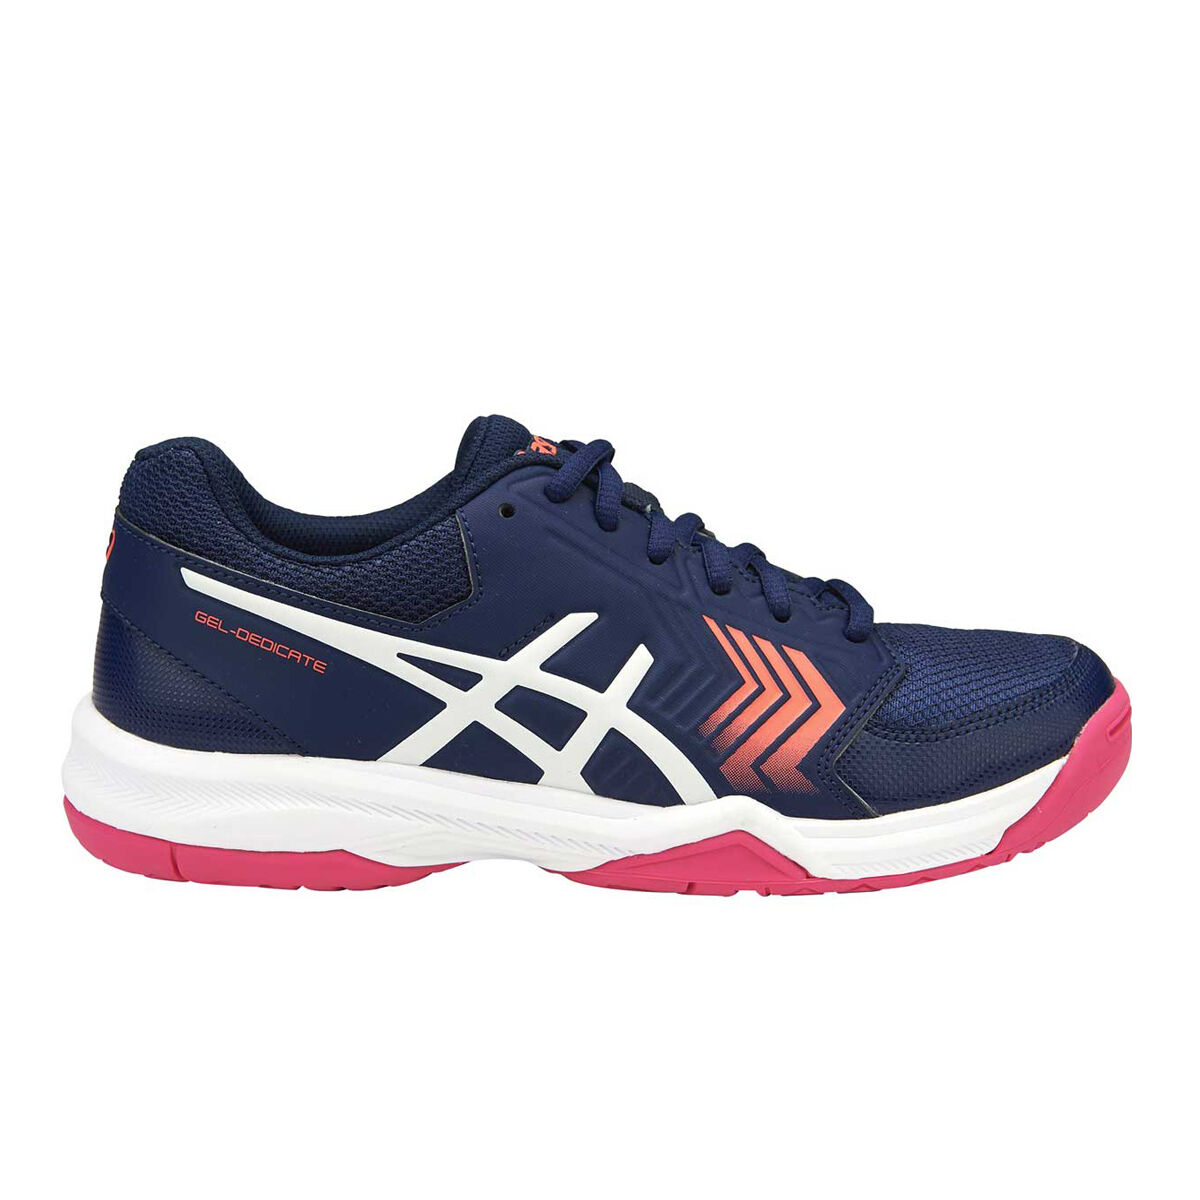 Asics Gel Dedicate 5 7 Chaussures de Tennis 10603 Femmes Gel Bleu/ Rose US 7   c492bd6 - bechdeltestfest.website